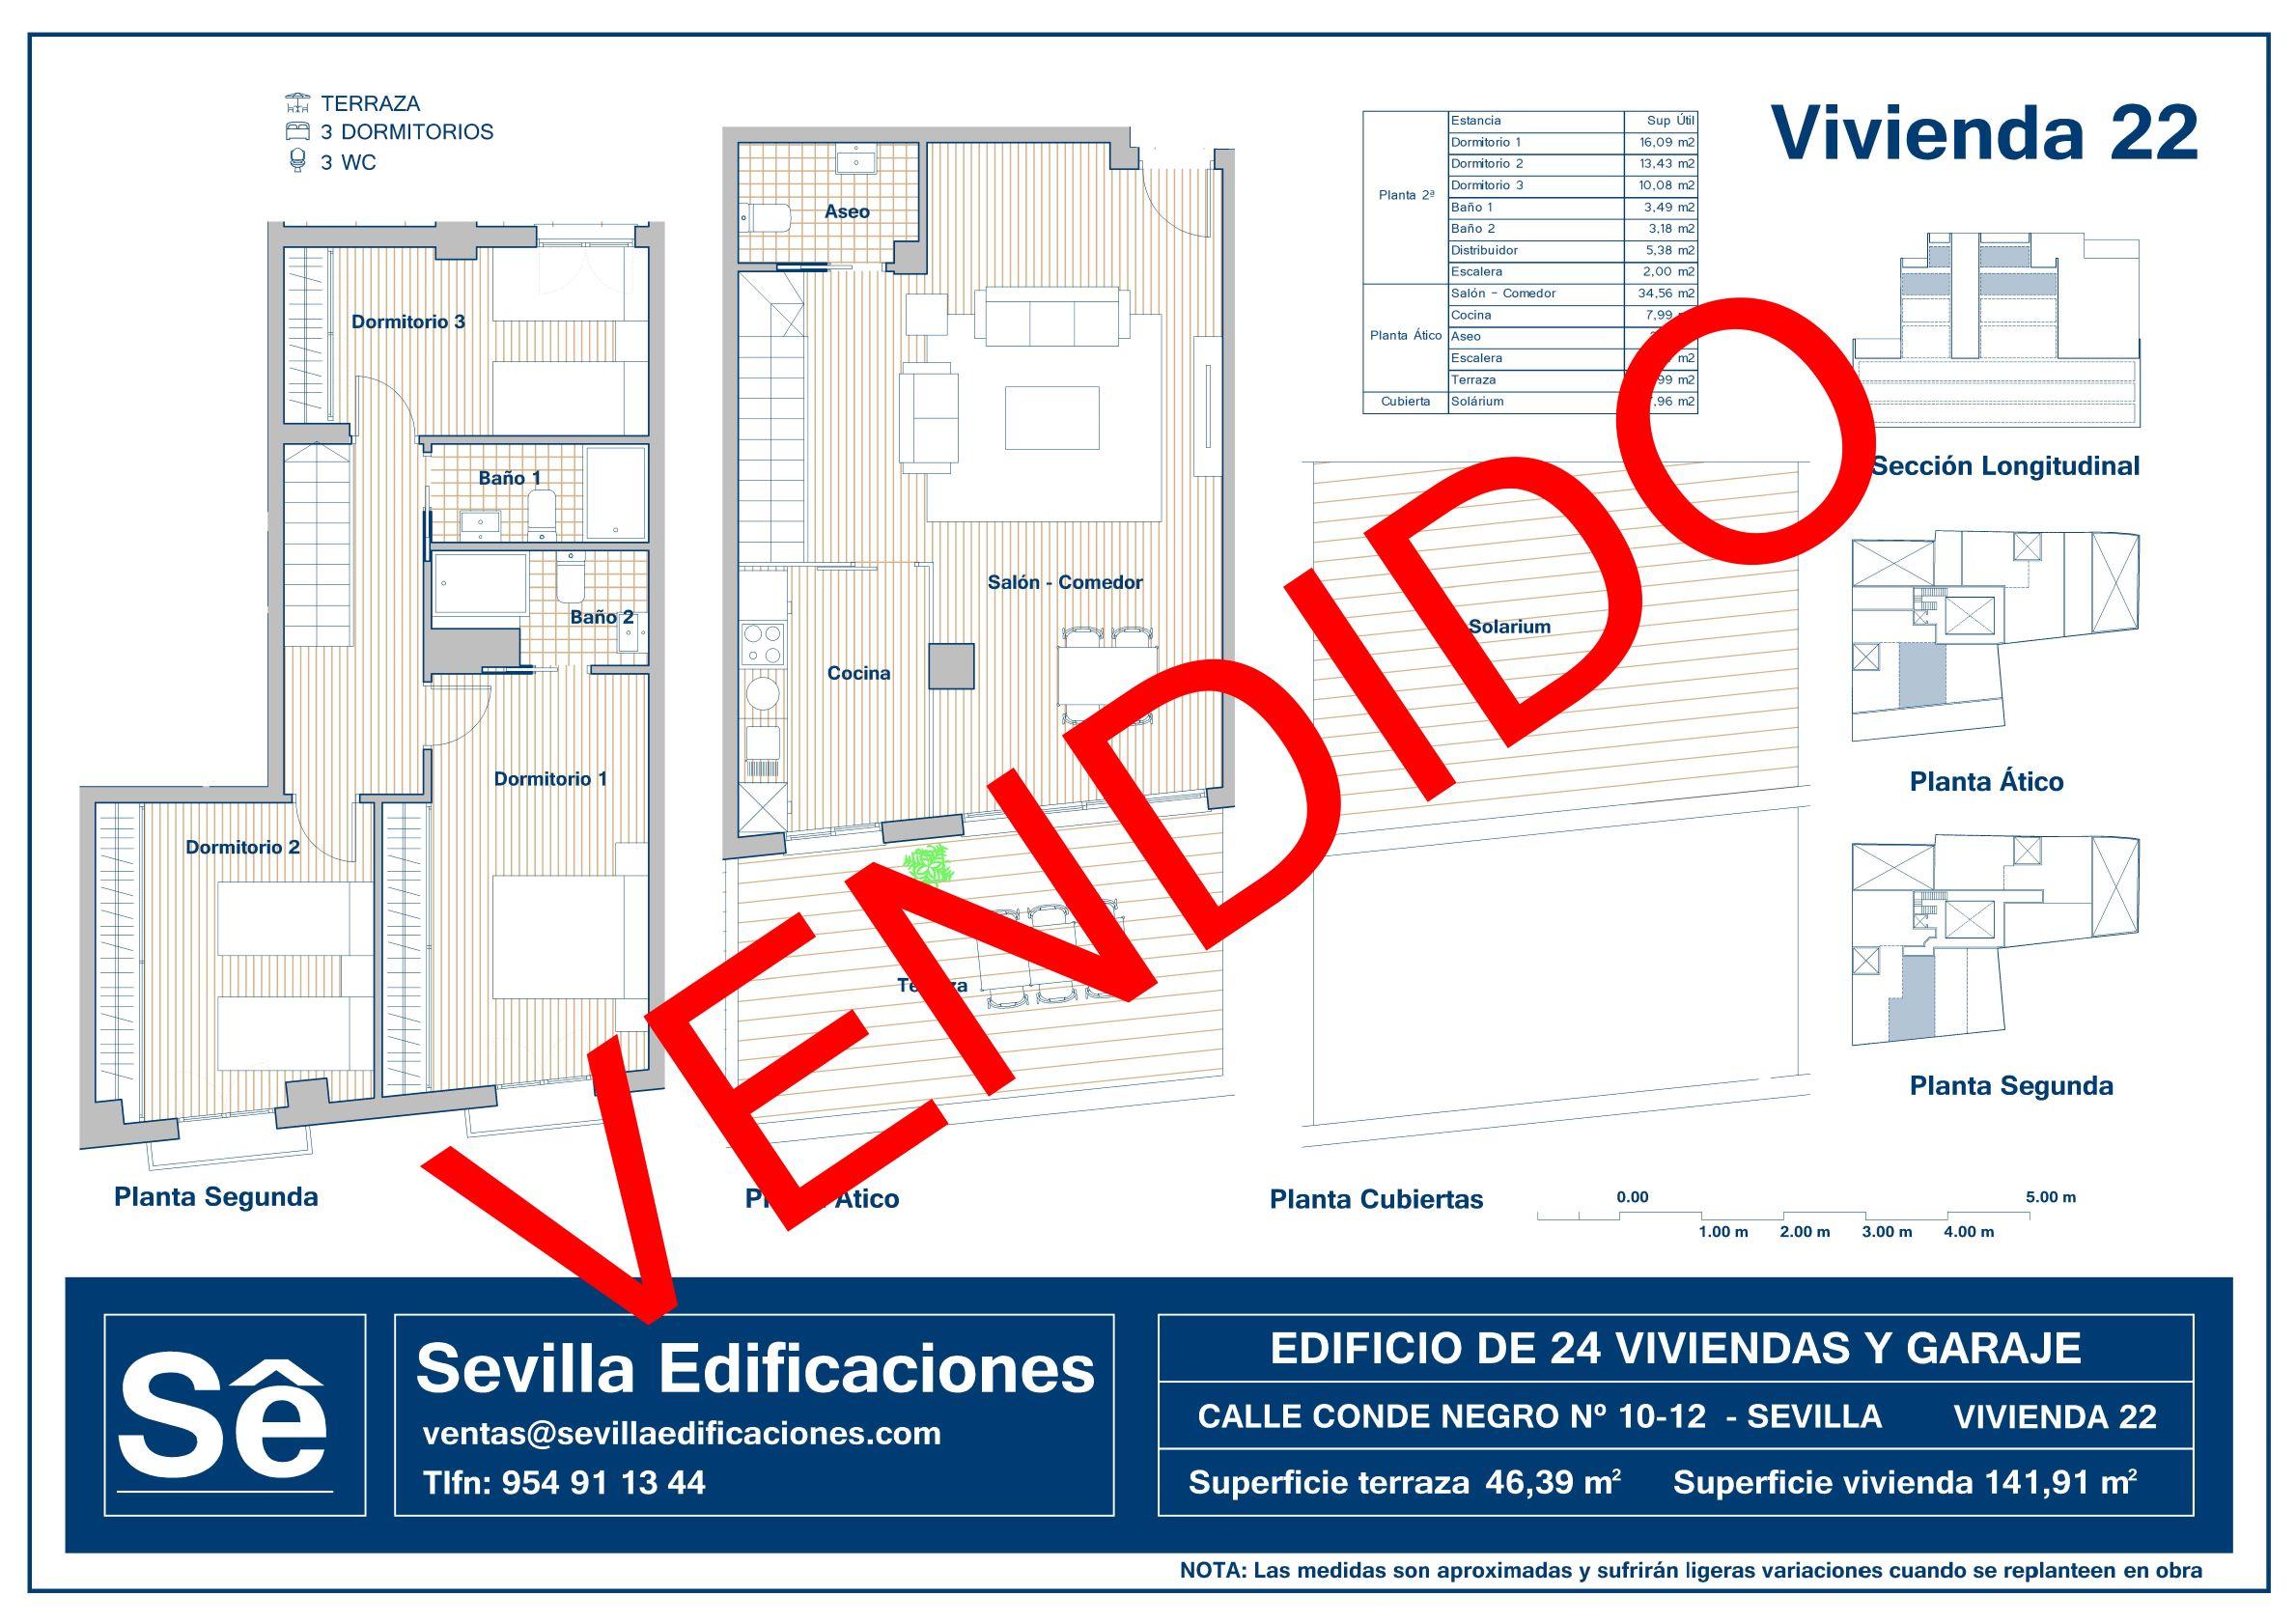 CONDENEGRO_VIVIENDA_22_VENDIDO